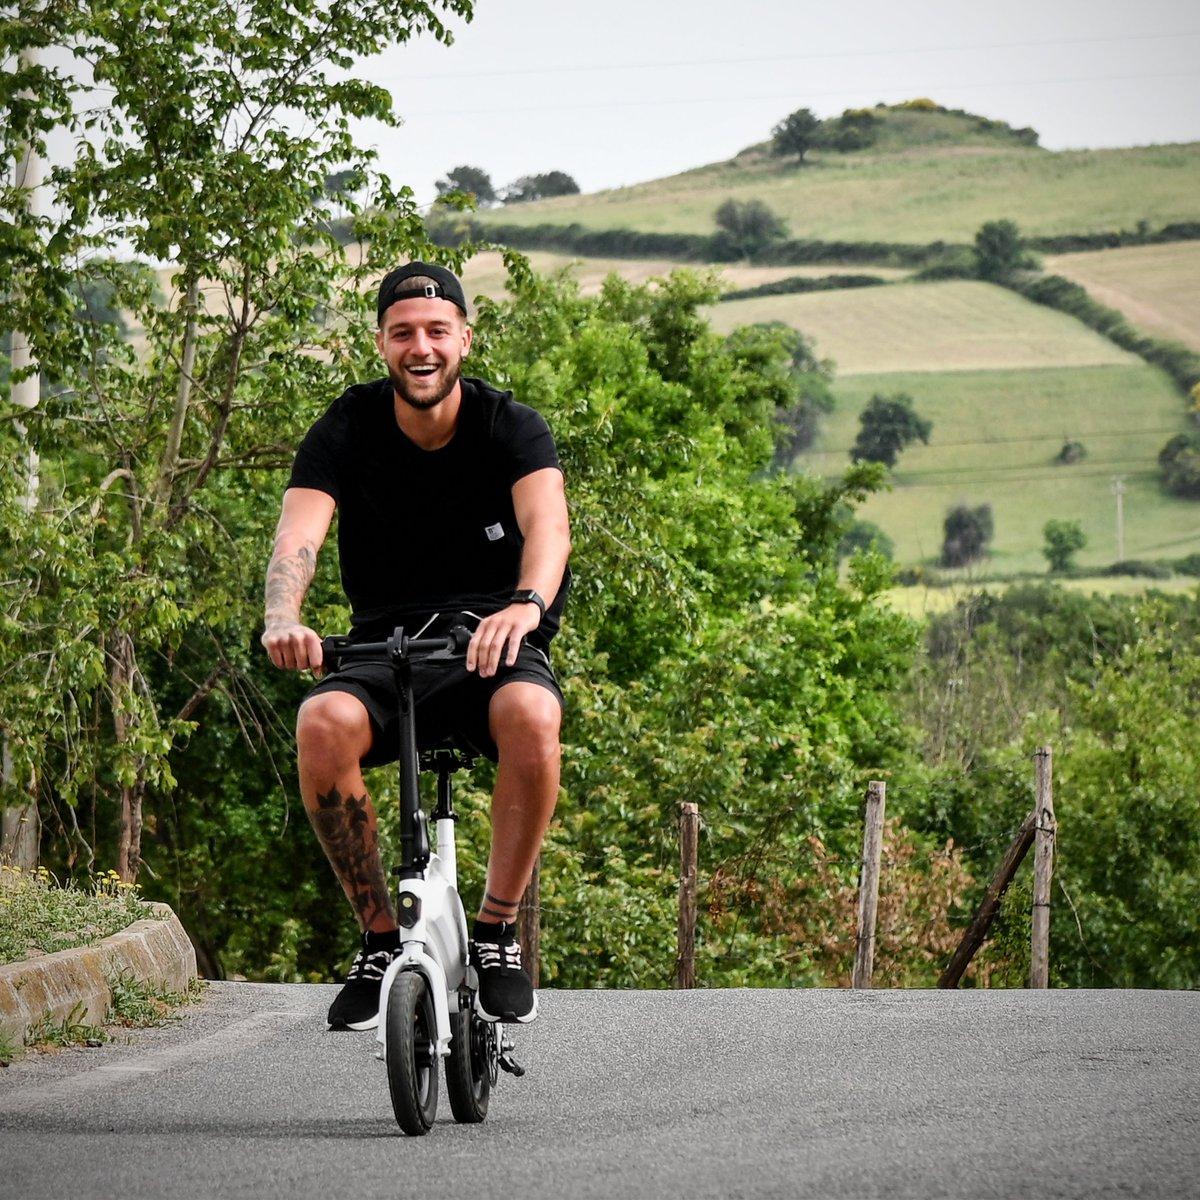 Sergej Milinkovic Savic turned up to Lazio training on an electric bike 😂